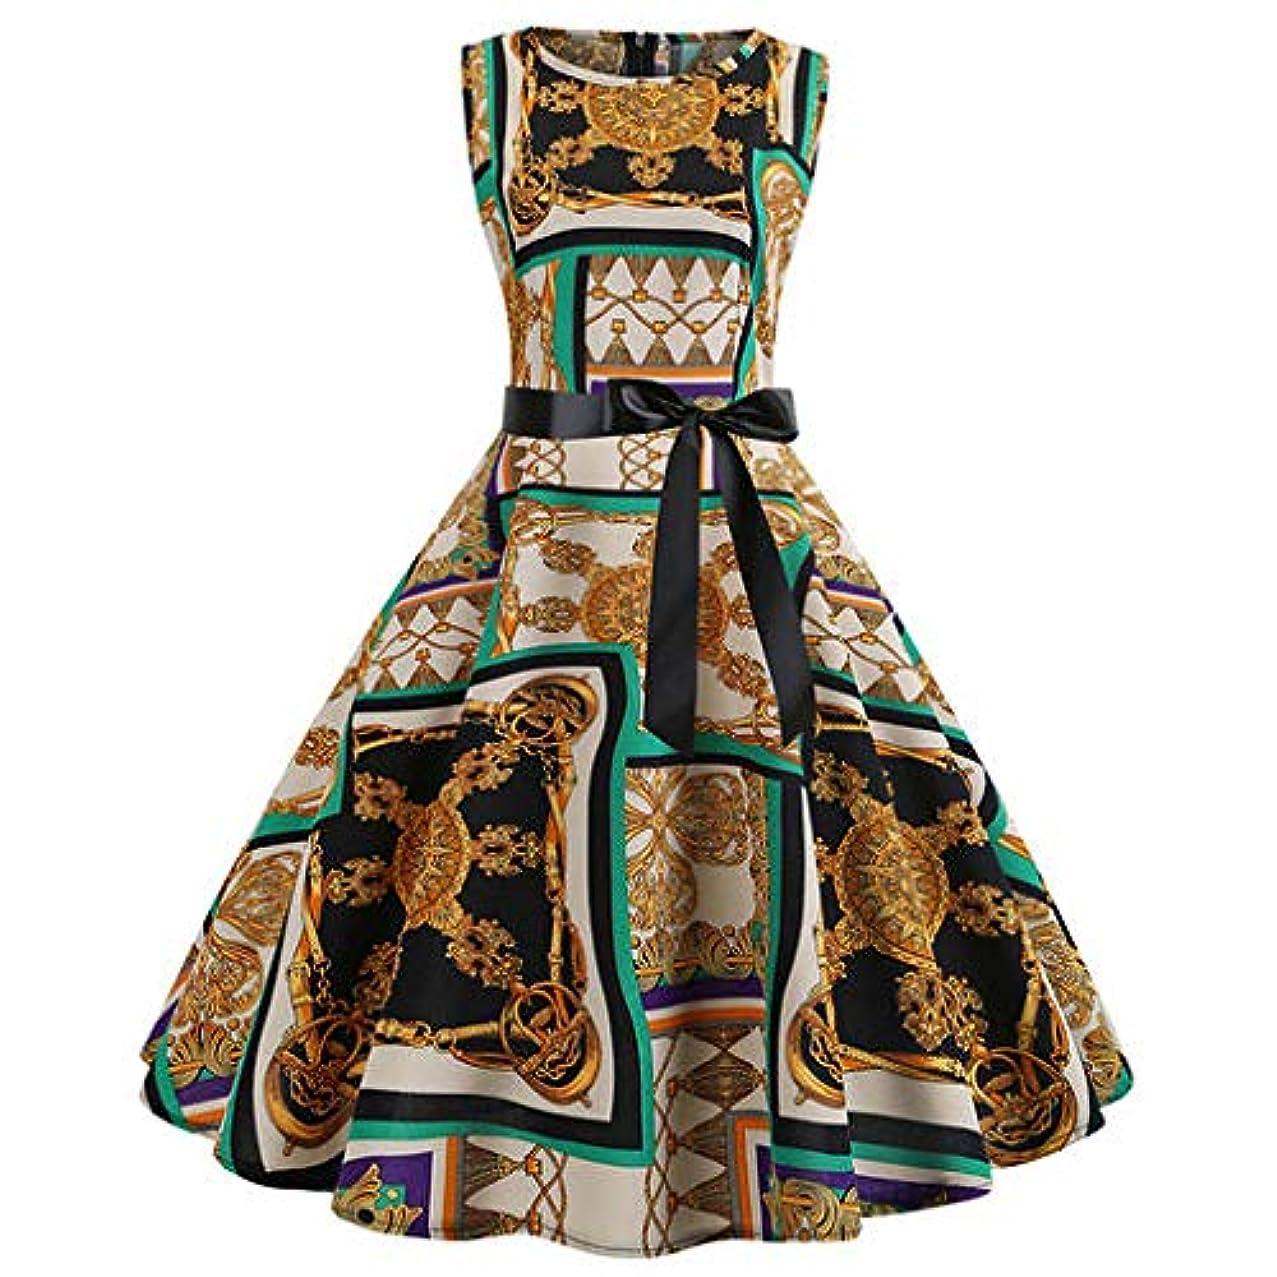 The Best Easter Gift!!!Women's Hepburn skirt Aries Esther Women Vintage 1950s Retro Sleeveless O Neck Print Evening Party Prom Swing Dress Yellow